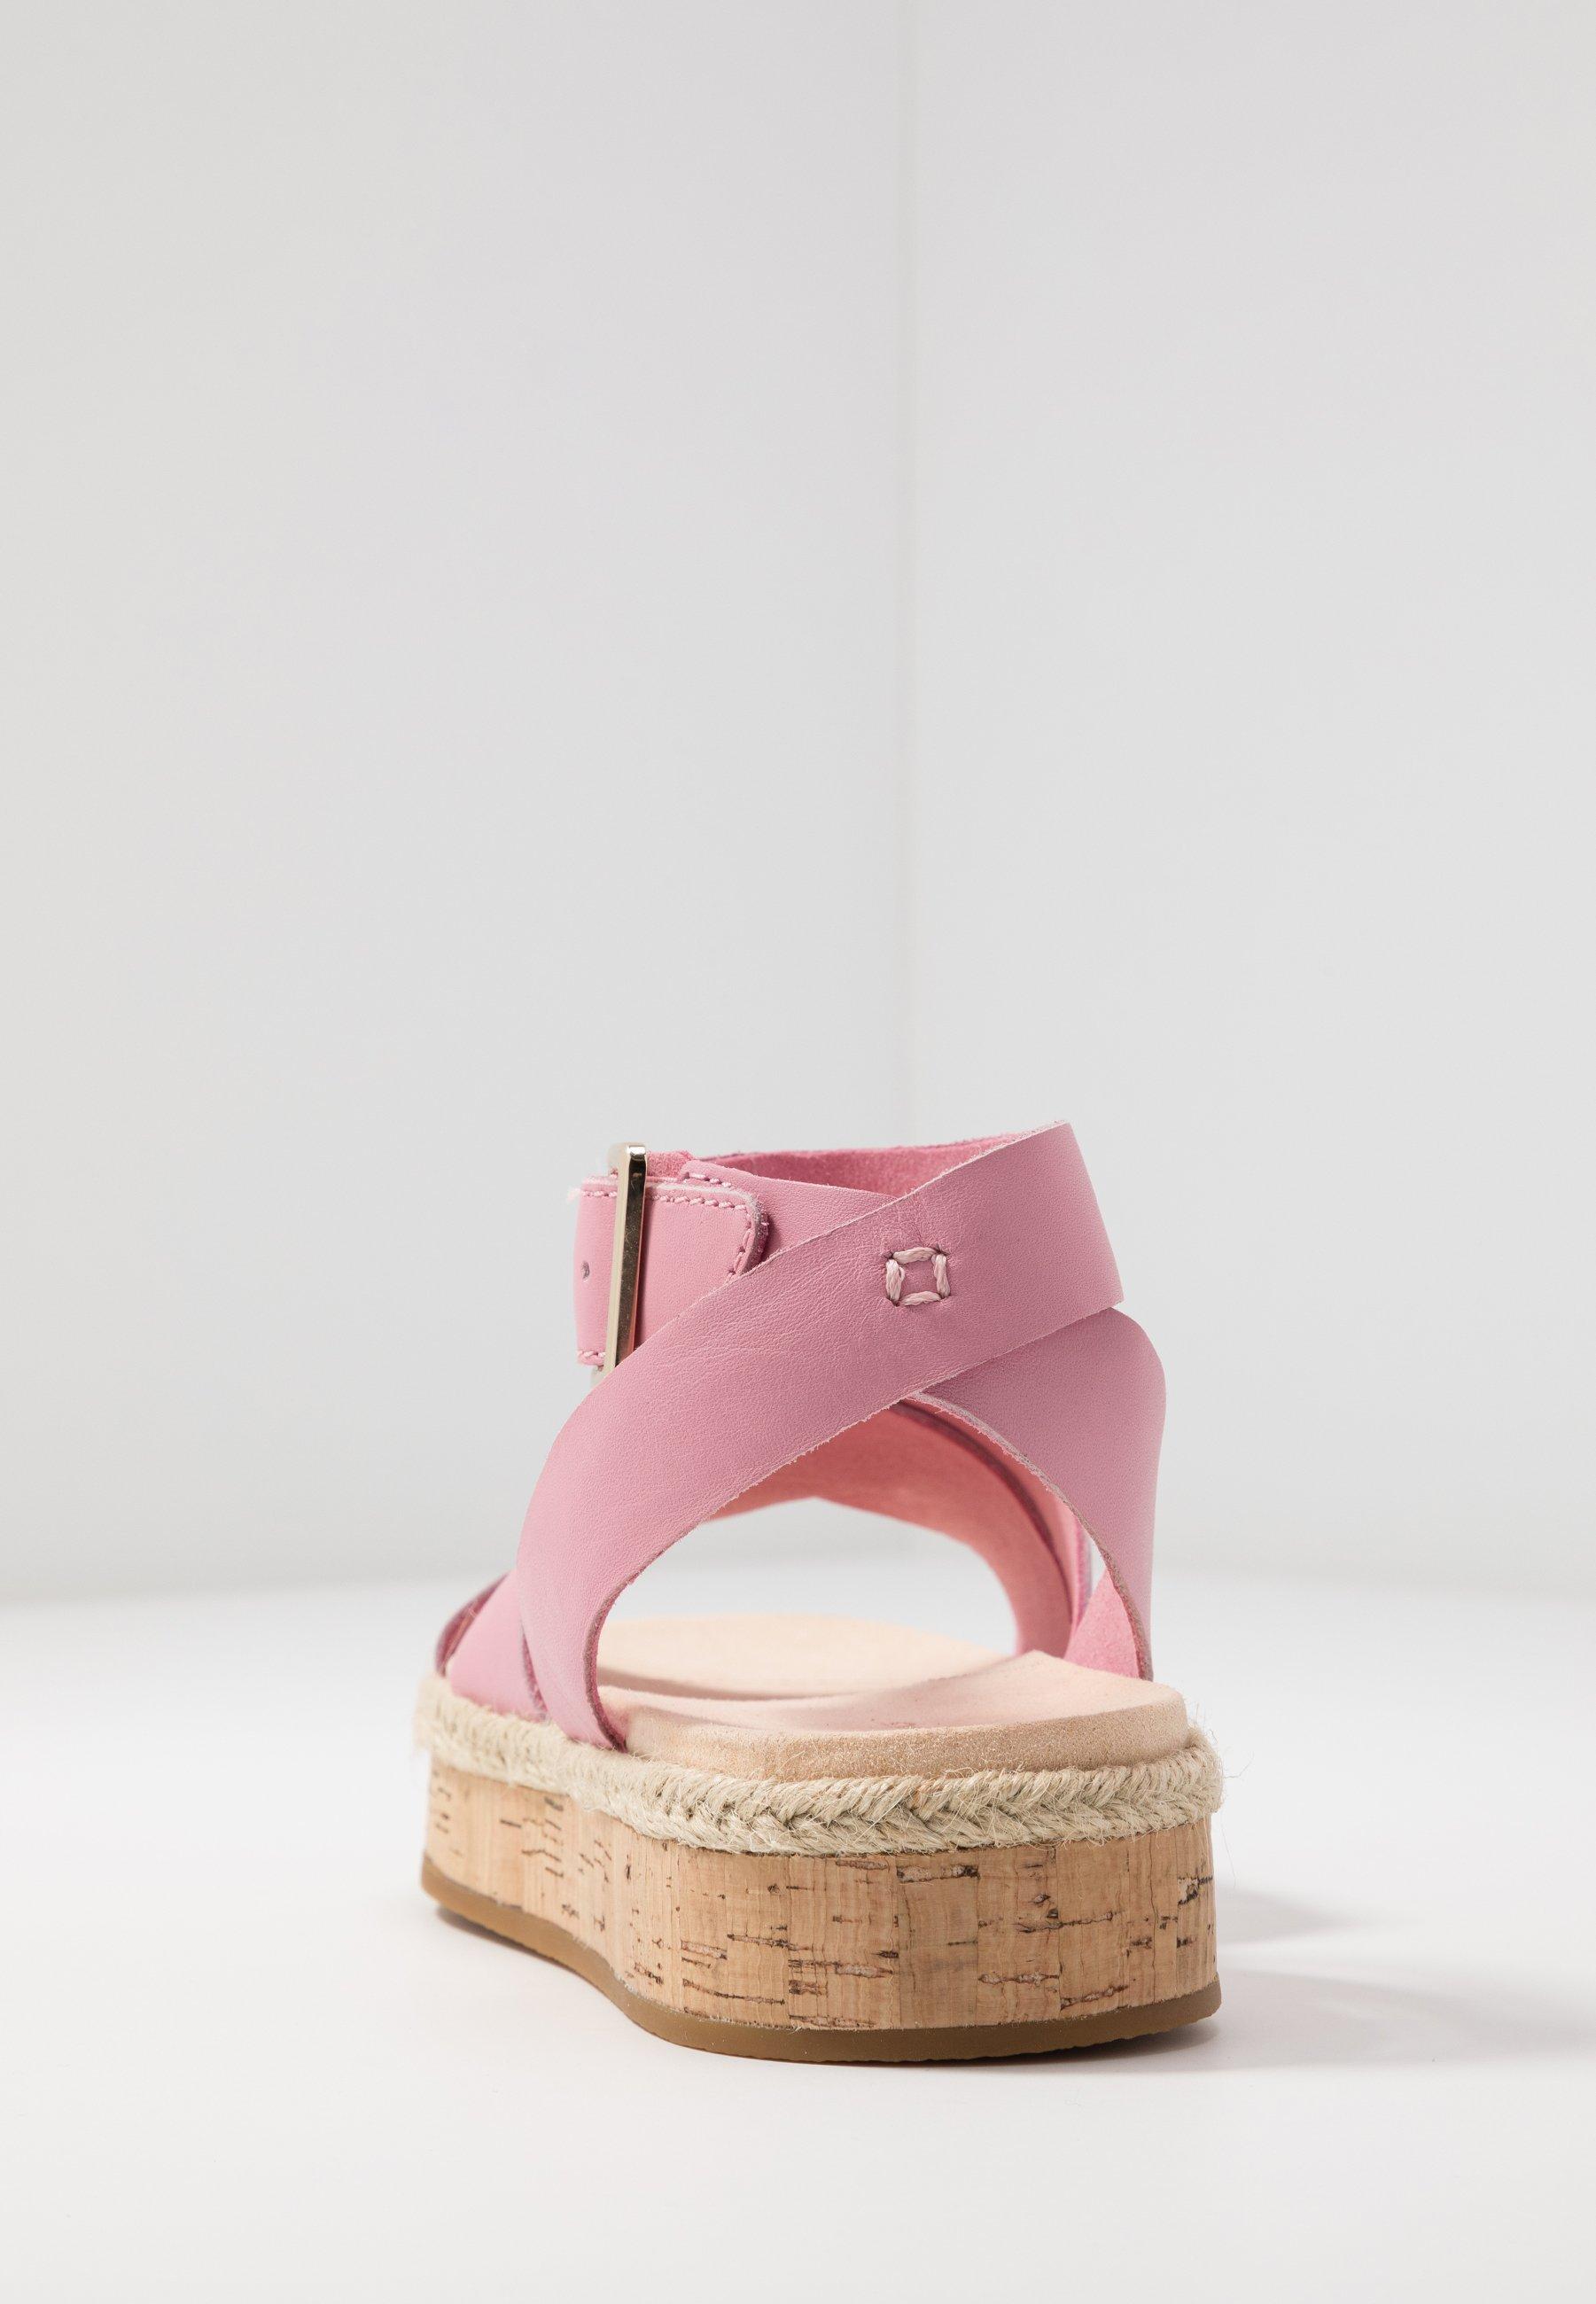 Clarks Botanic Poppy - Espadrille Pink